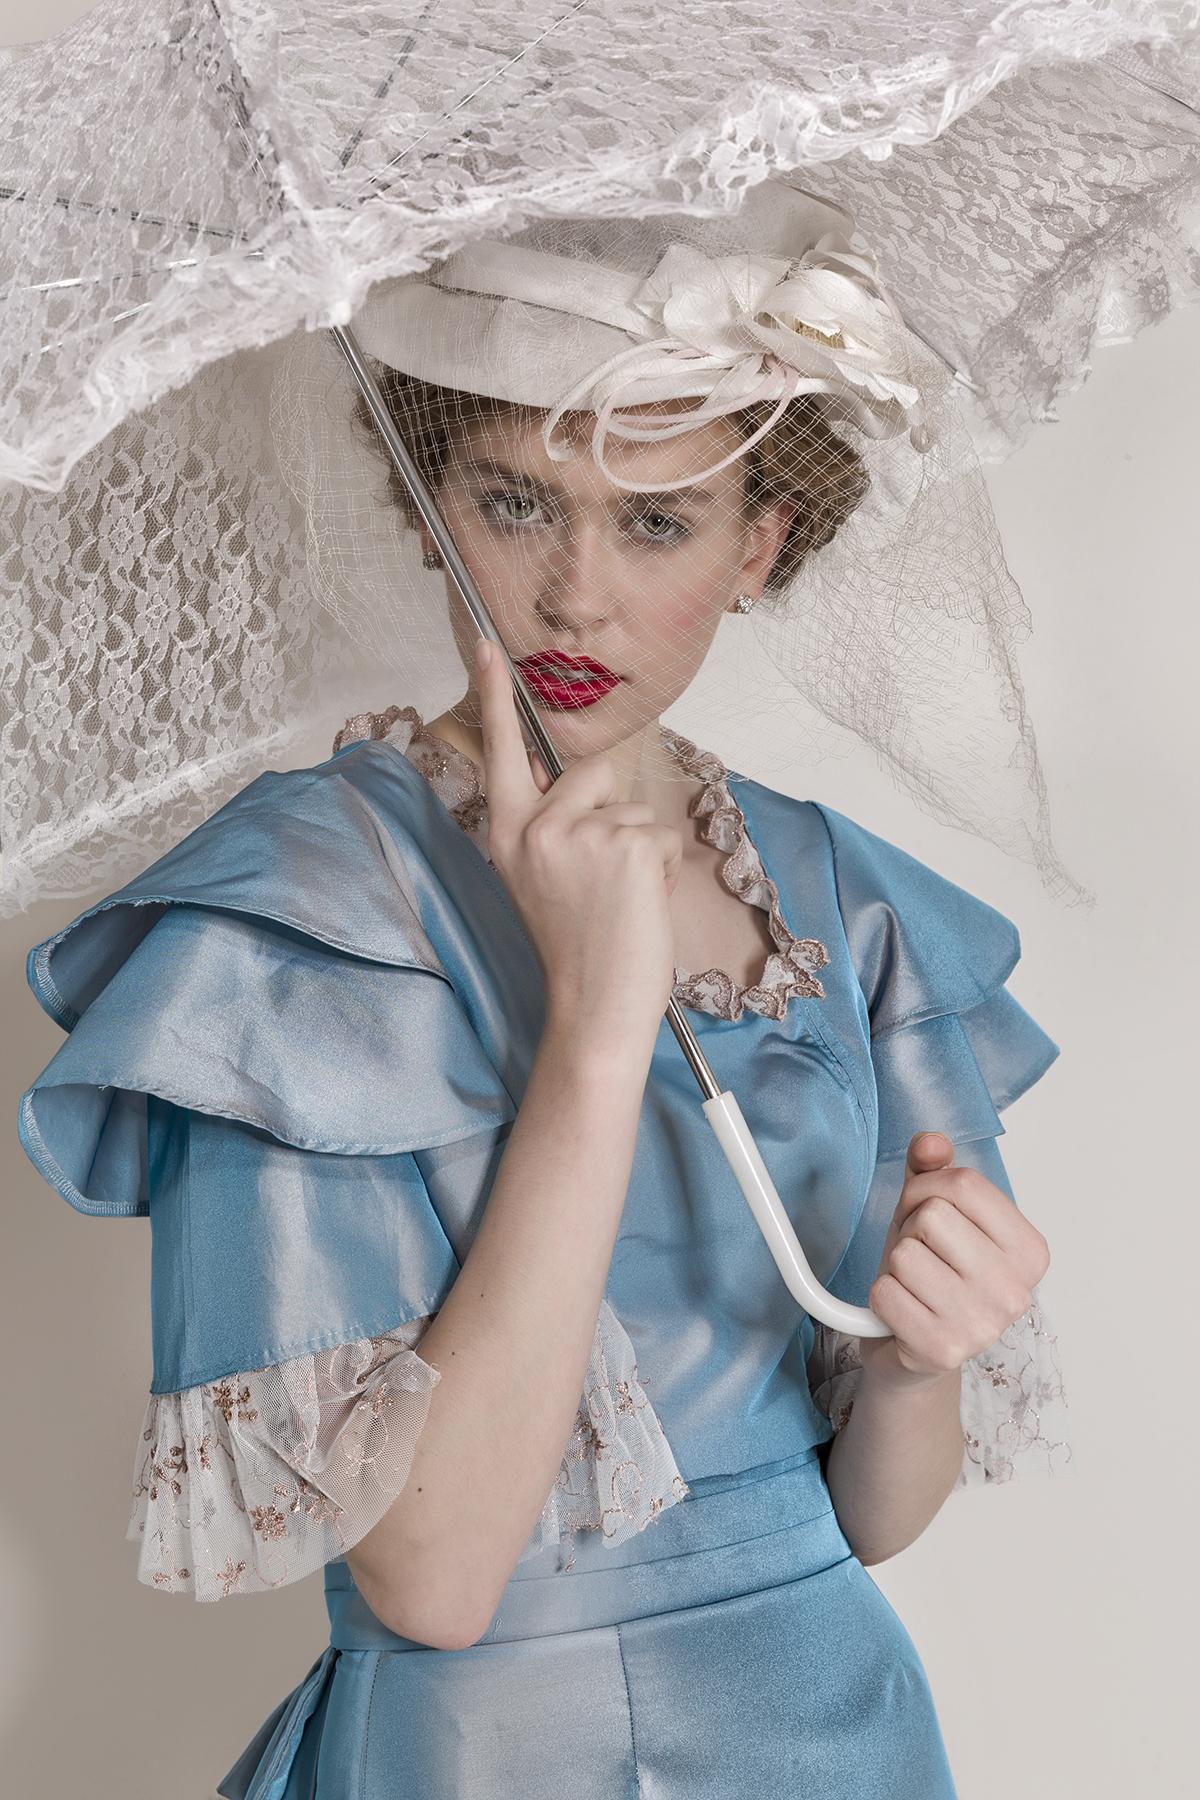 Damenmode der 1900er jahre belle epoque for Mobel 19 jahrhundert